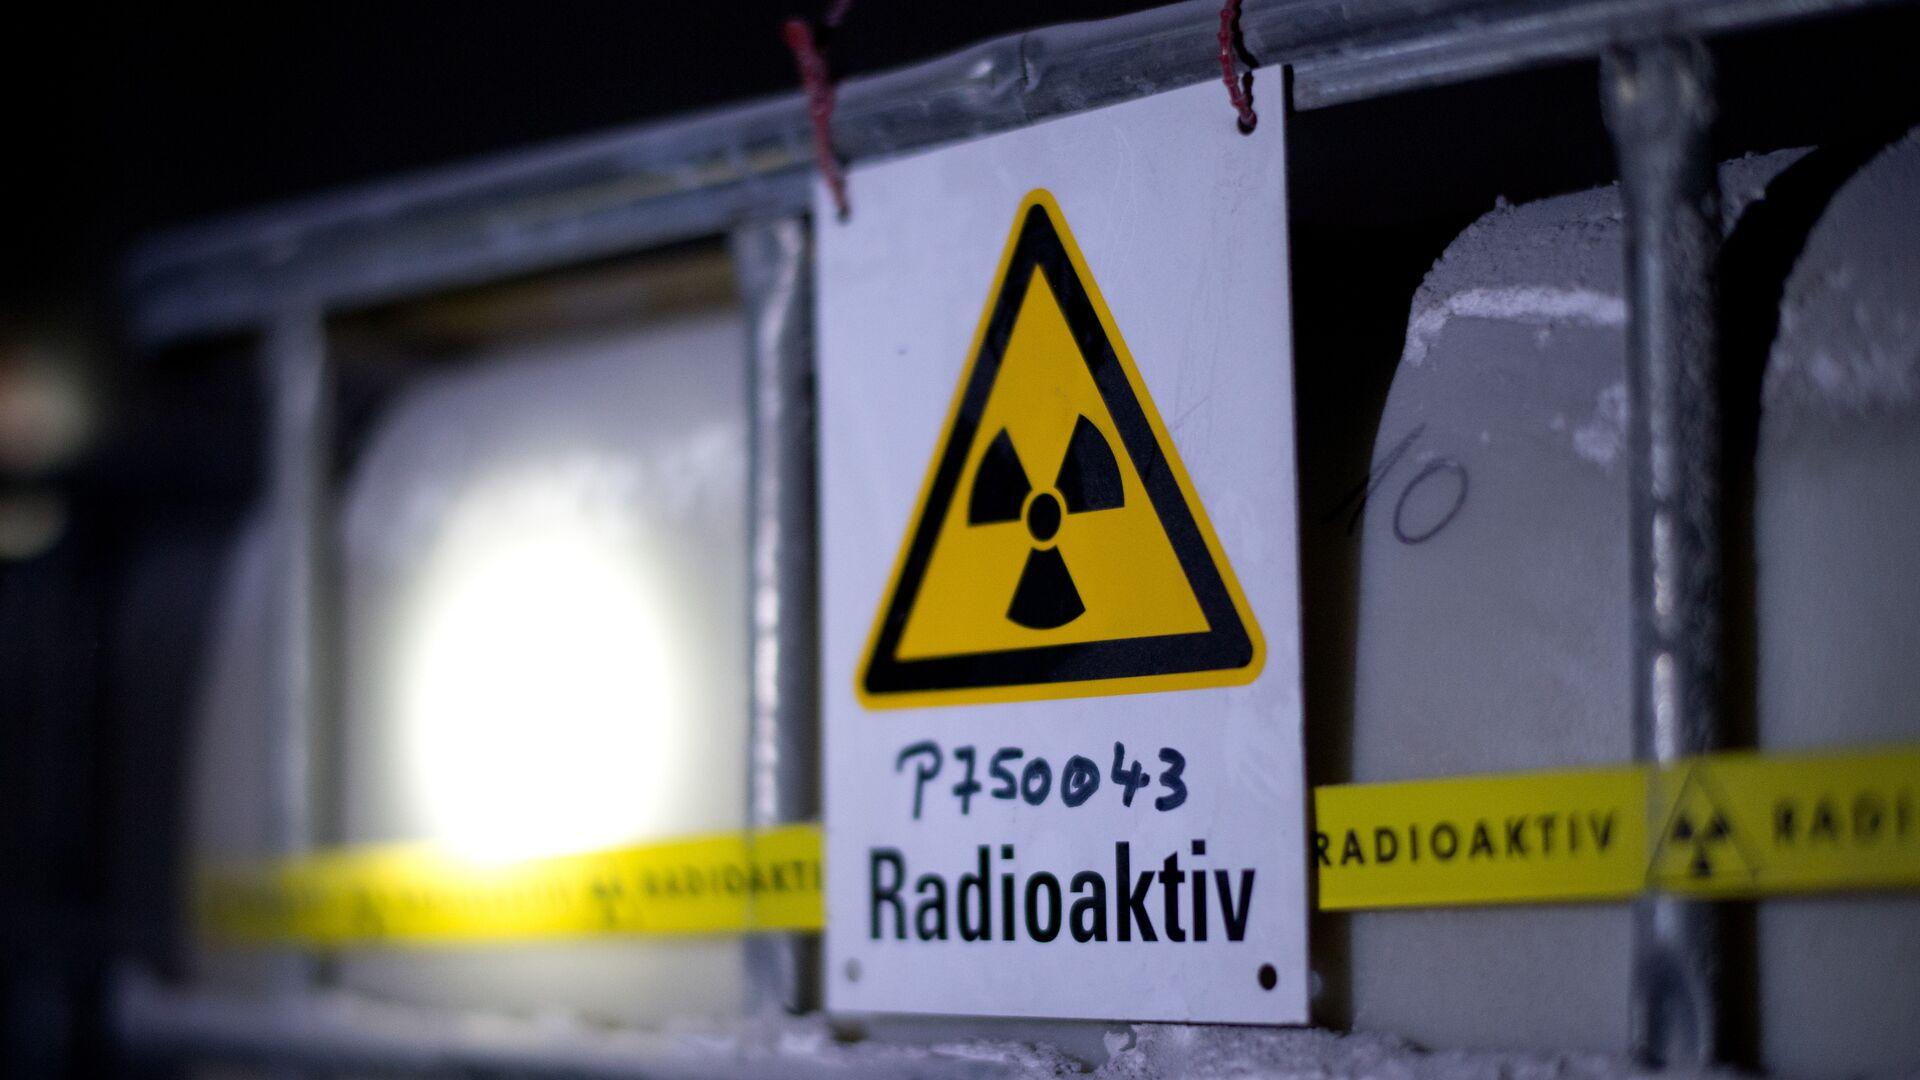 Materiale radioattivo - Sputnik Italia, 1920, 26.05.2021